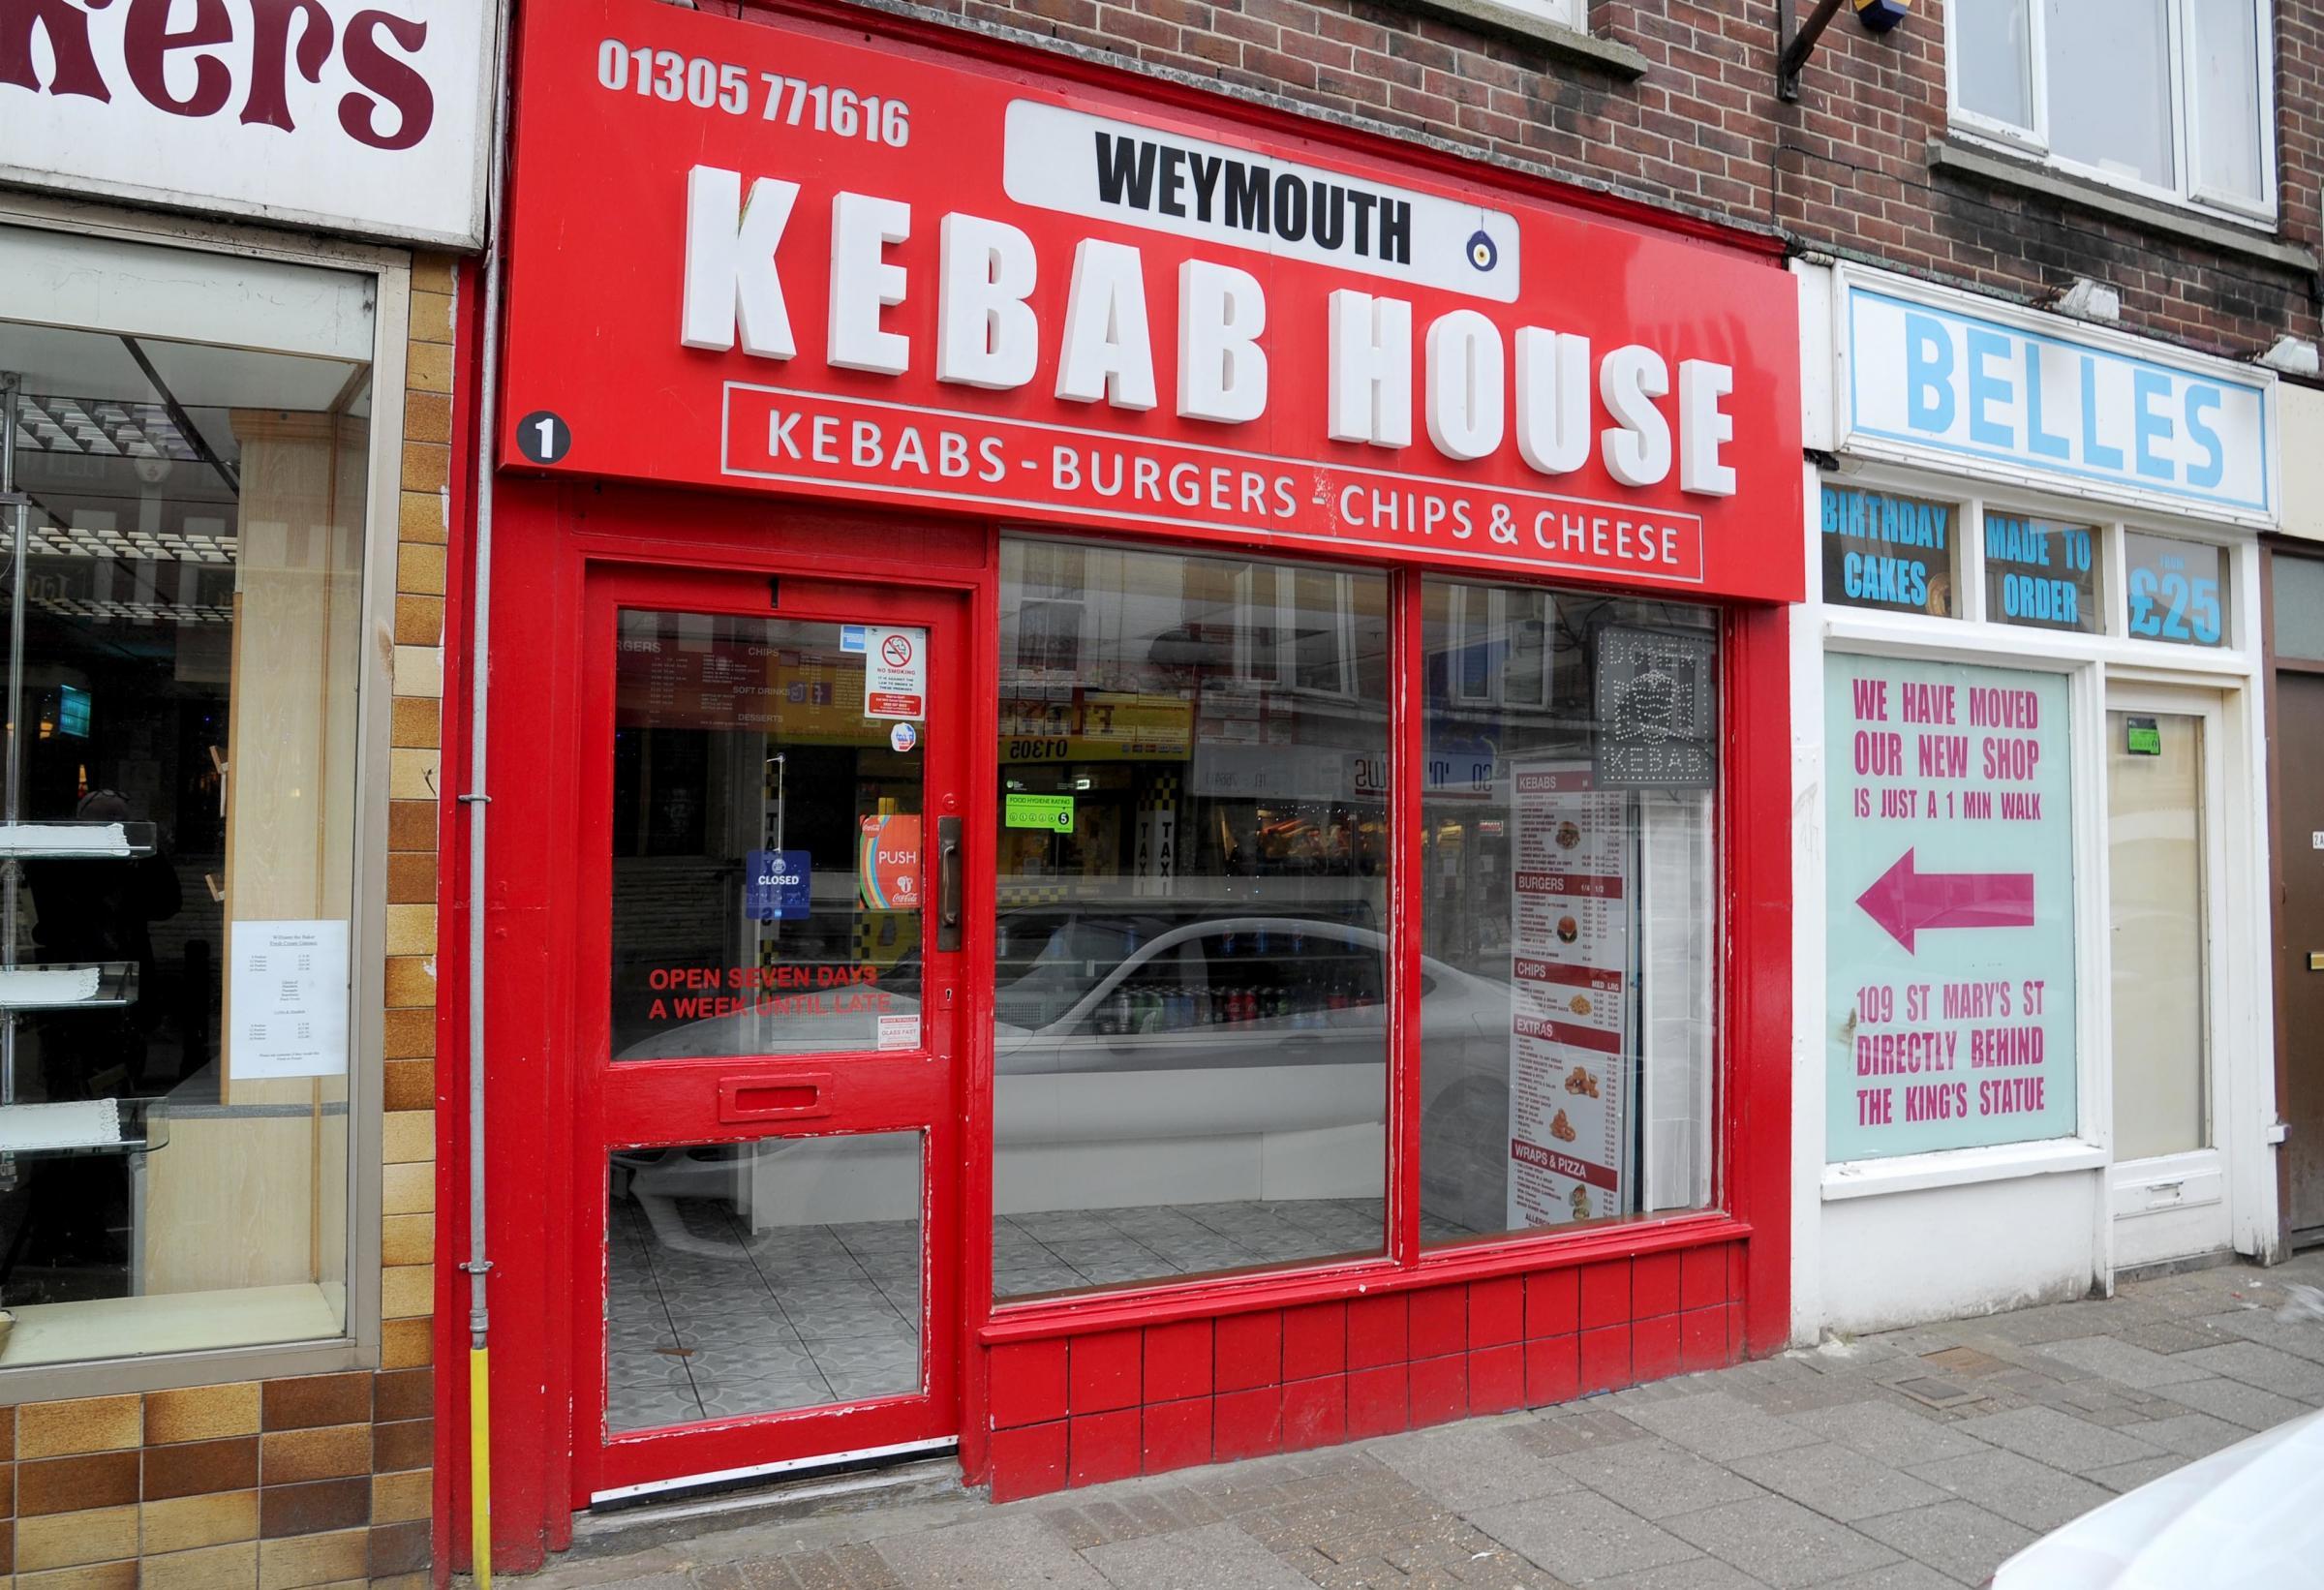 Alcohol night sale plan for Weymouth Kebab House